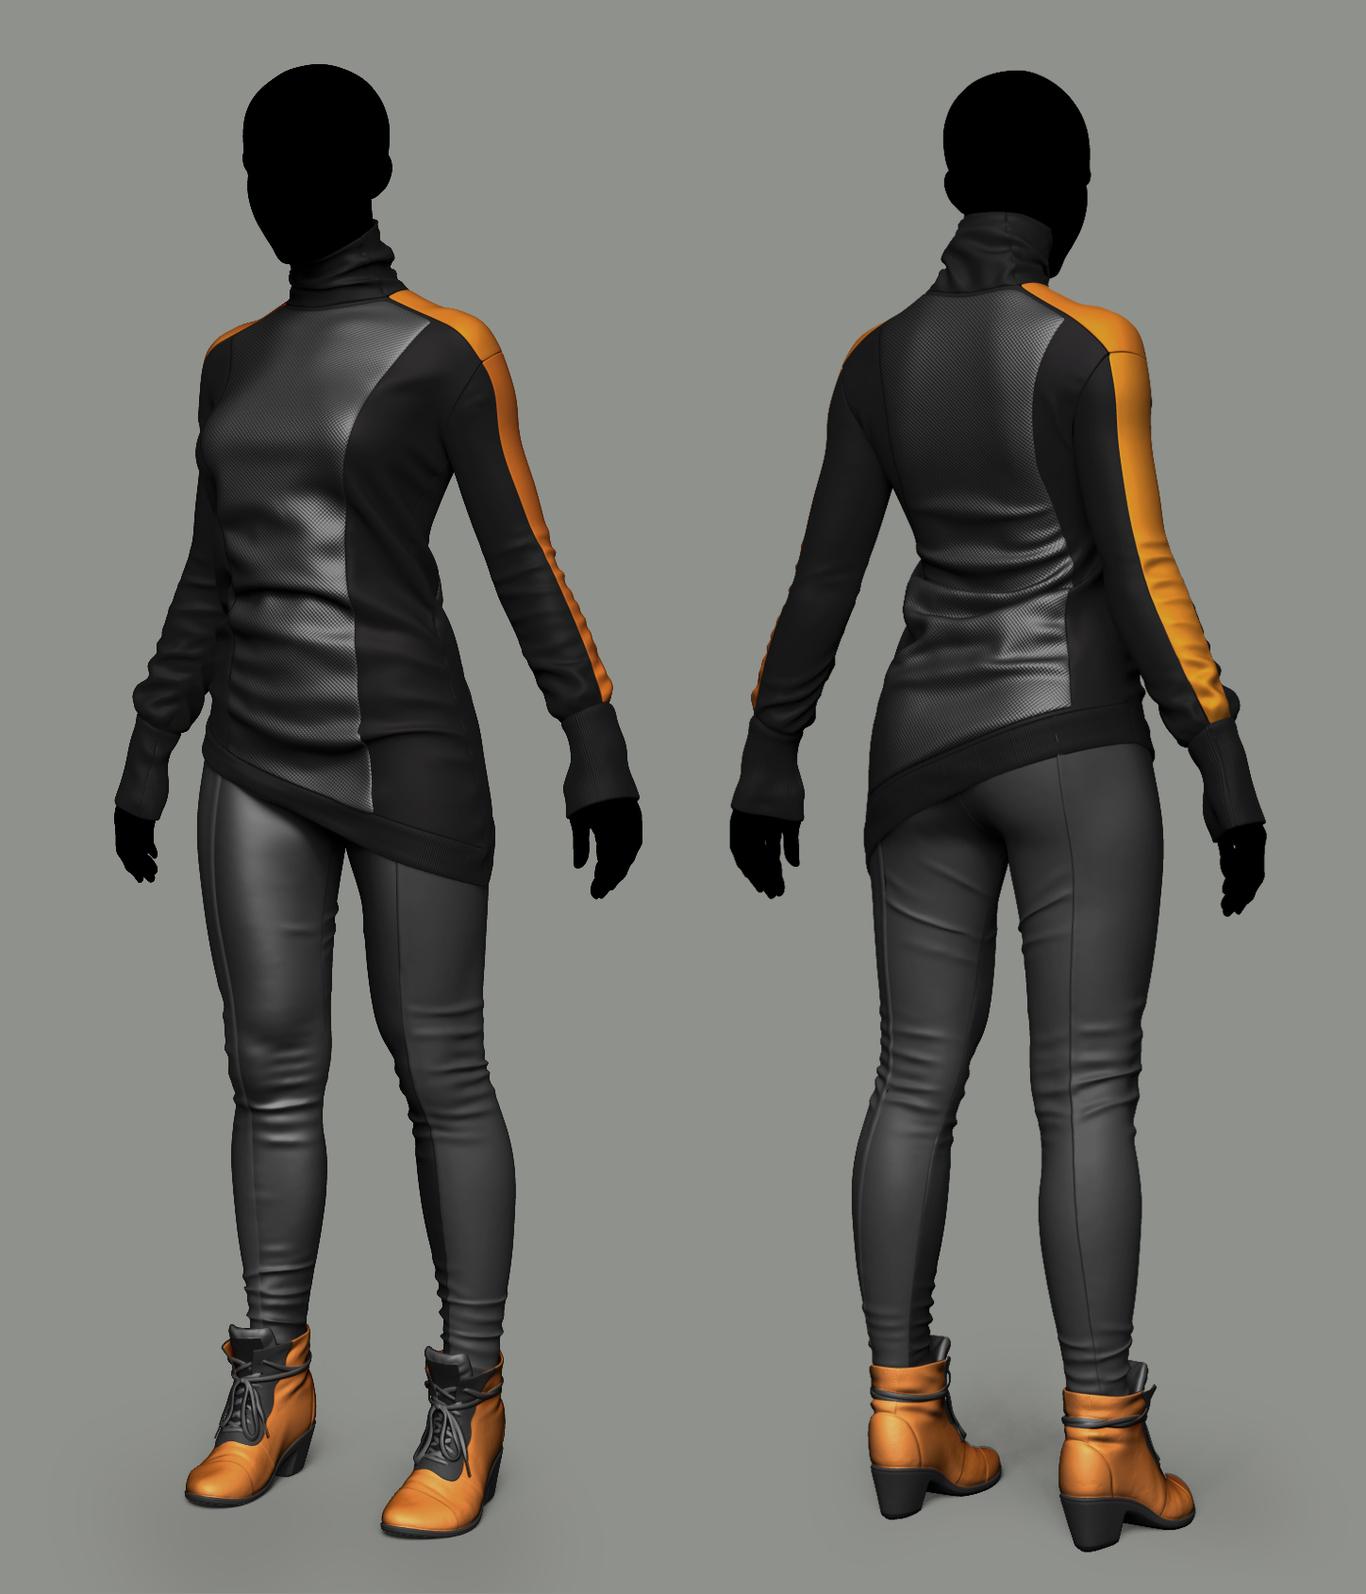 Velimirkondic cyberpunk clothing p 1 b9409fcc 67qp